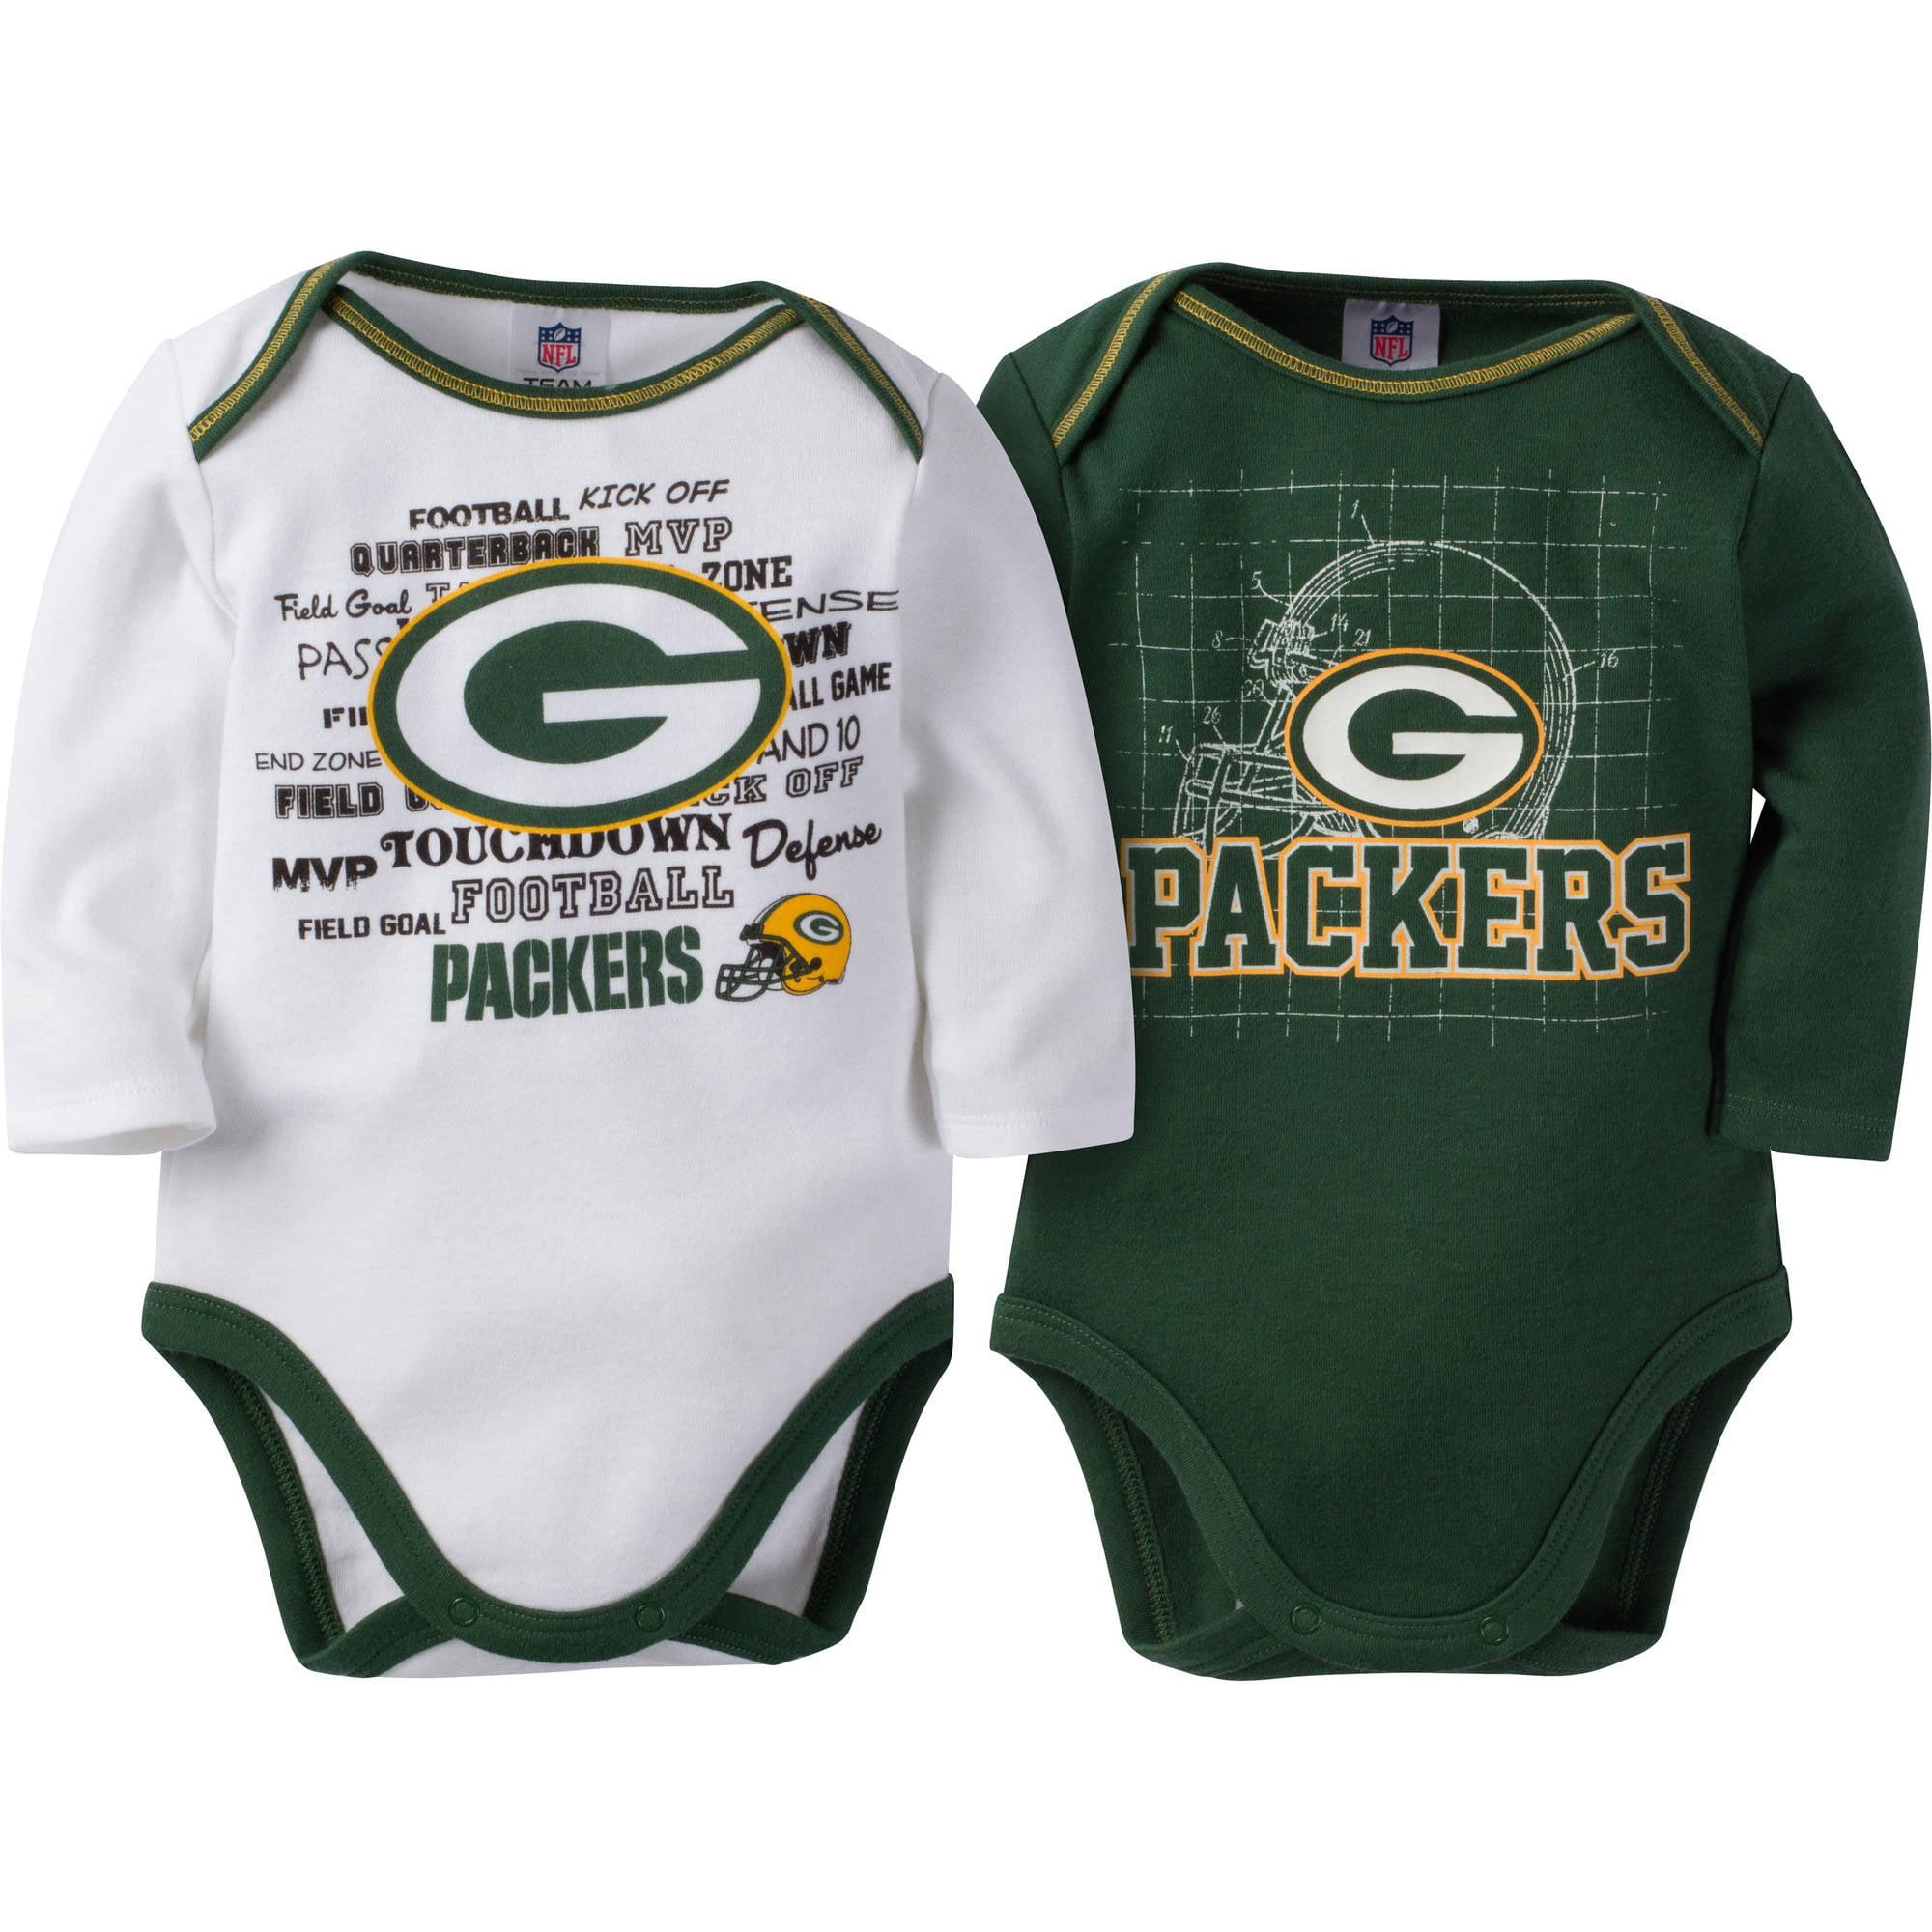 NFL Green Bay Packers Baby Boys Long Sleeve Bodysuit Set, 2-Pack